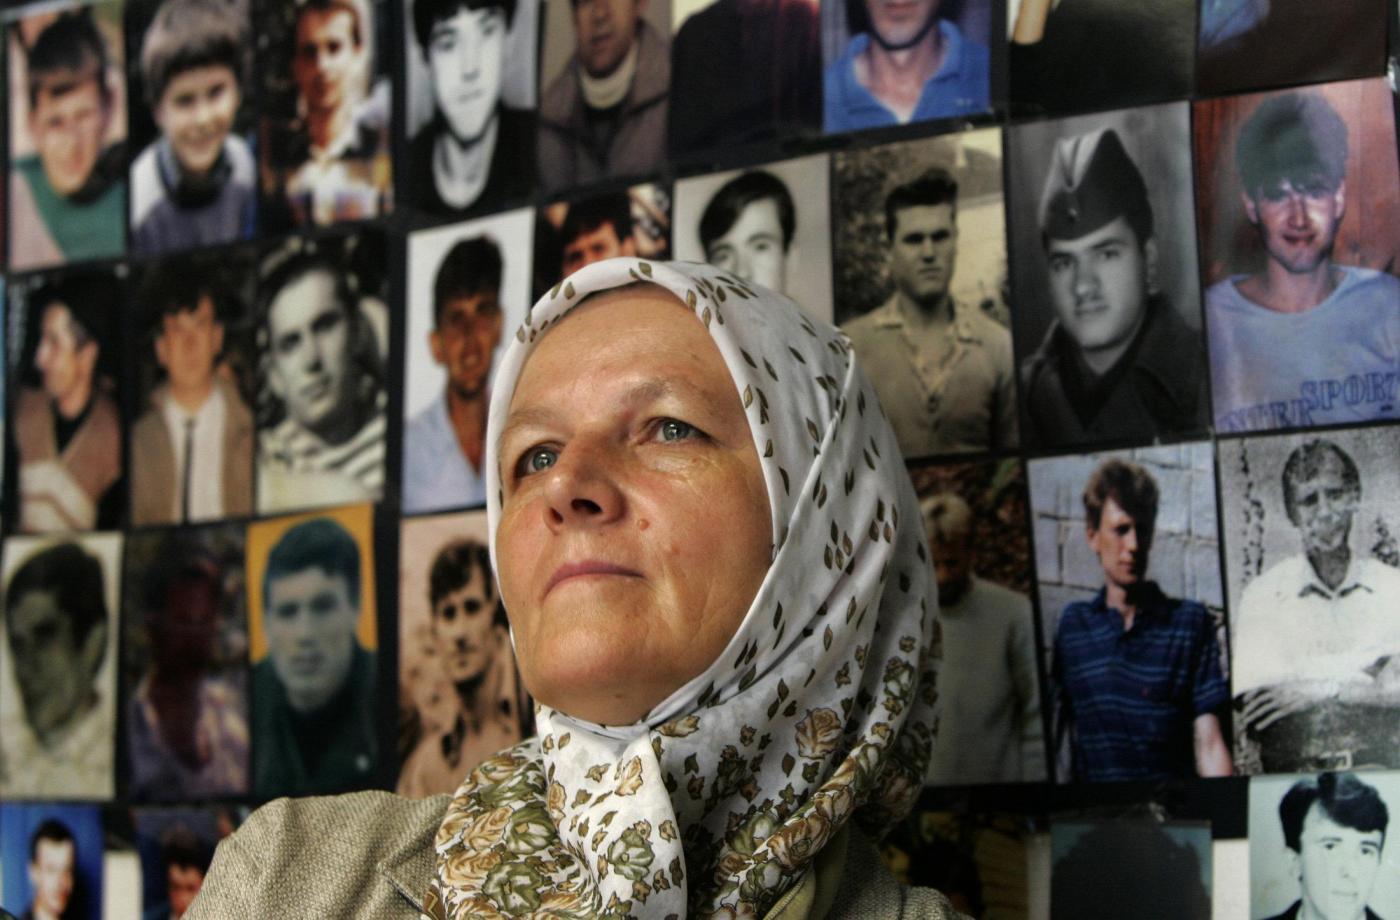 Ex Jugoslavia massacro di Srebrenica sentenza per Radovan Karadzic